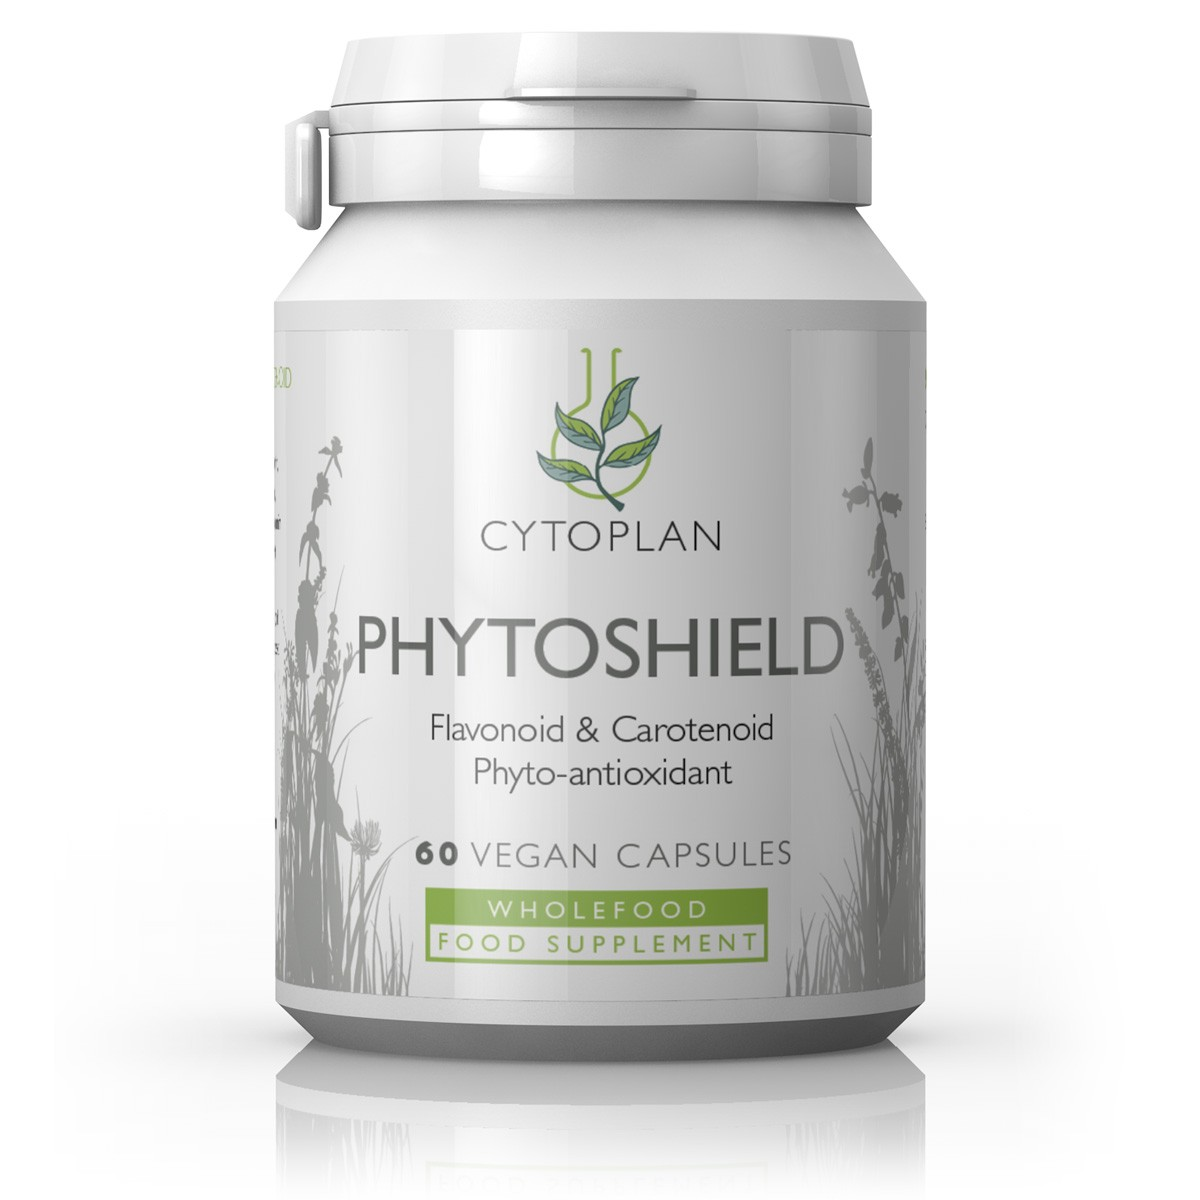 Phytoshield 60's